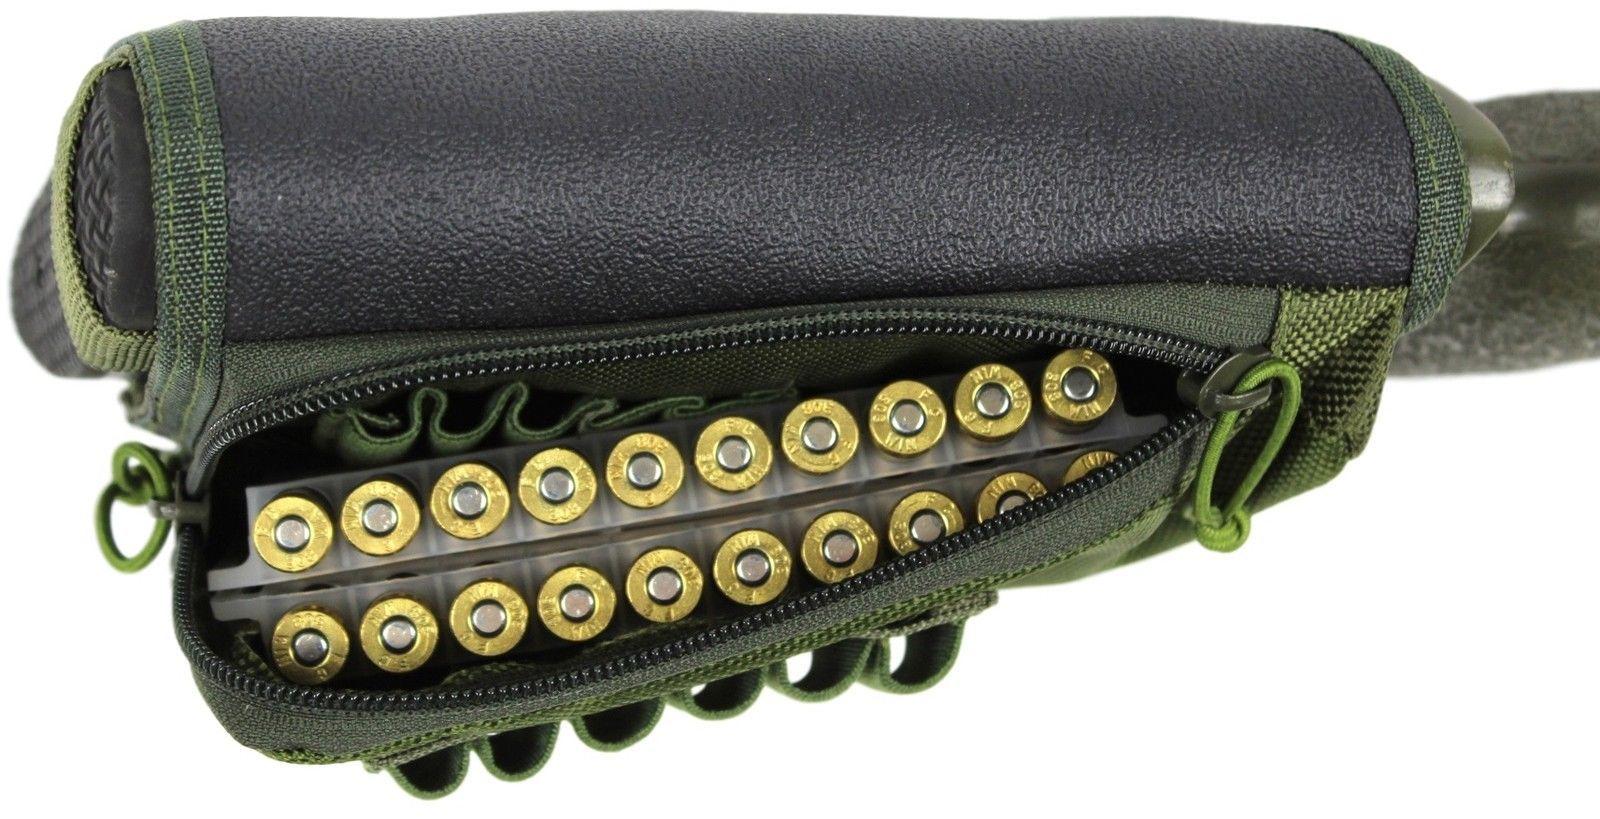 Rifle Stock Pack | Cheek Pad Riser | Buttstock Ammo Holder